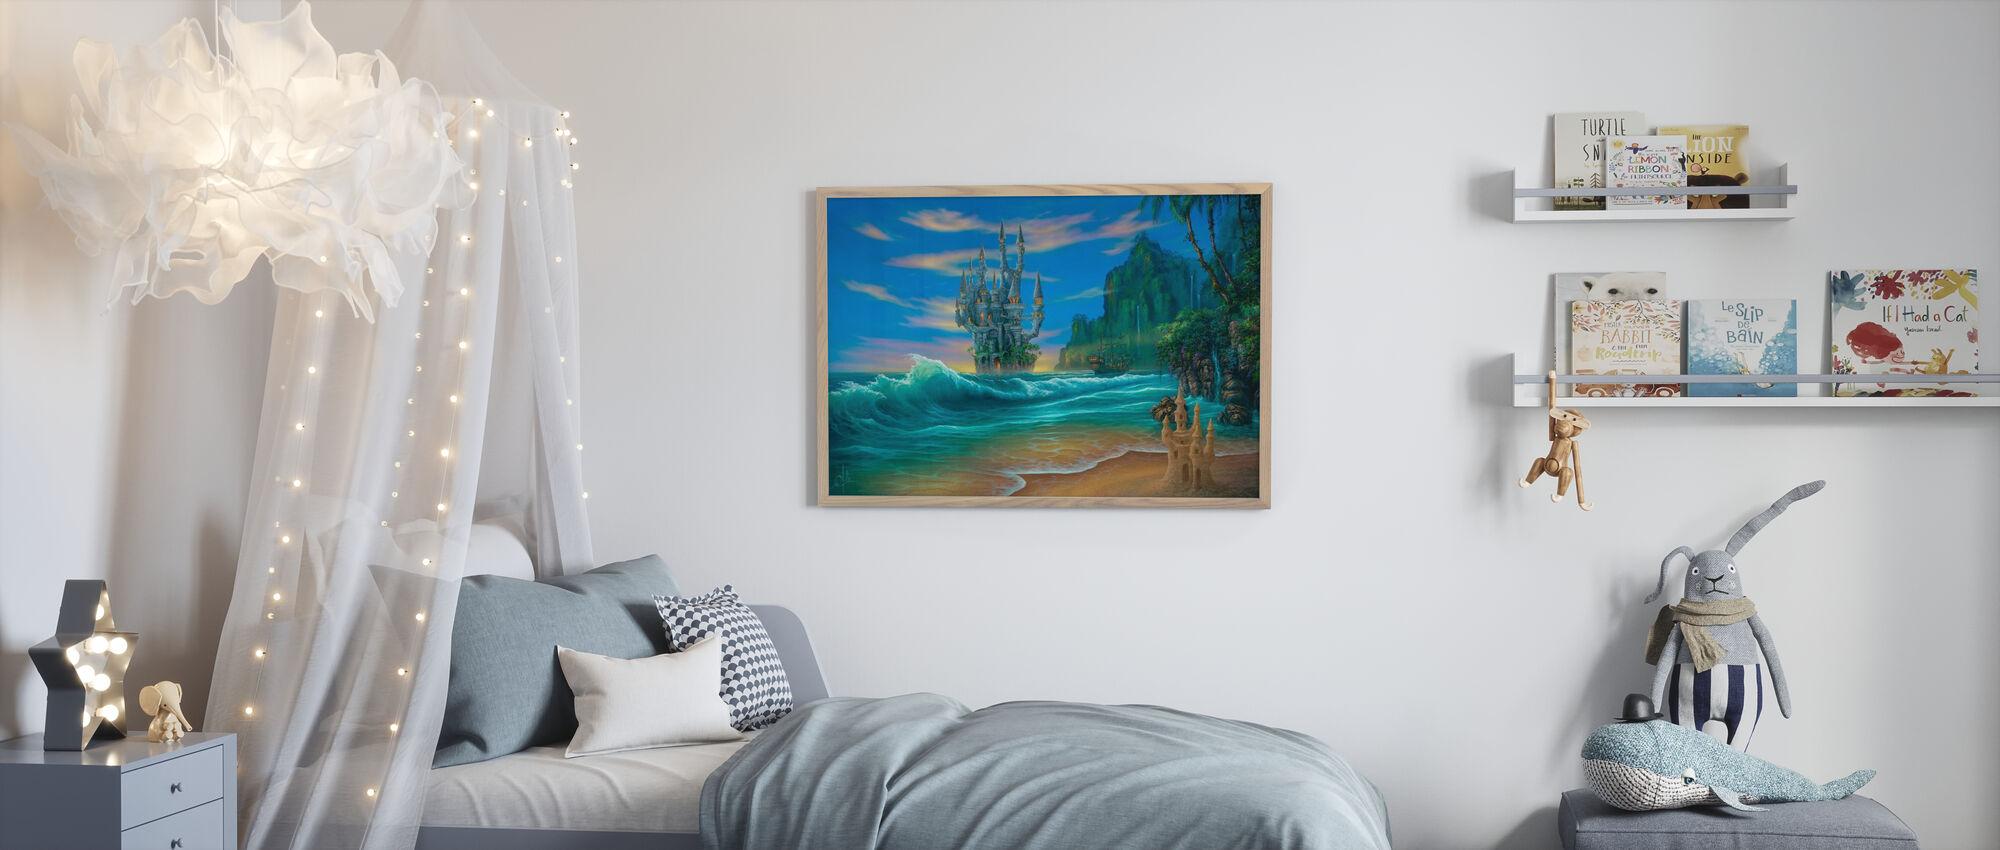 Fantasy Beach - Poster - Kids Room